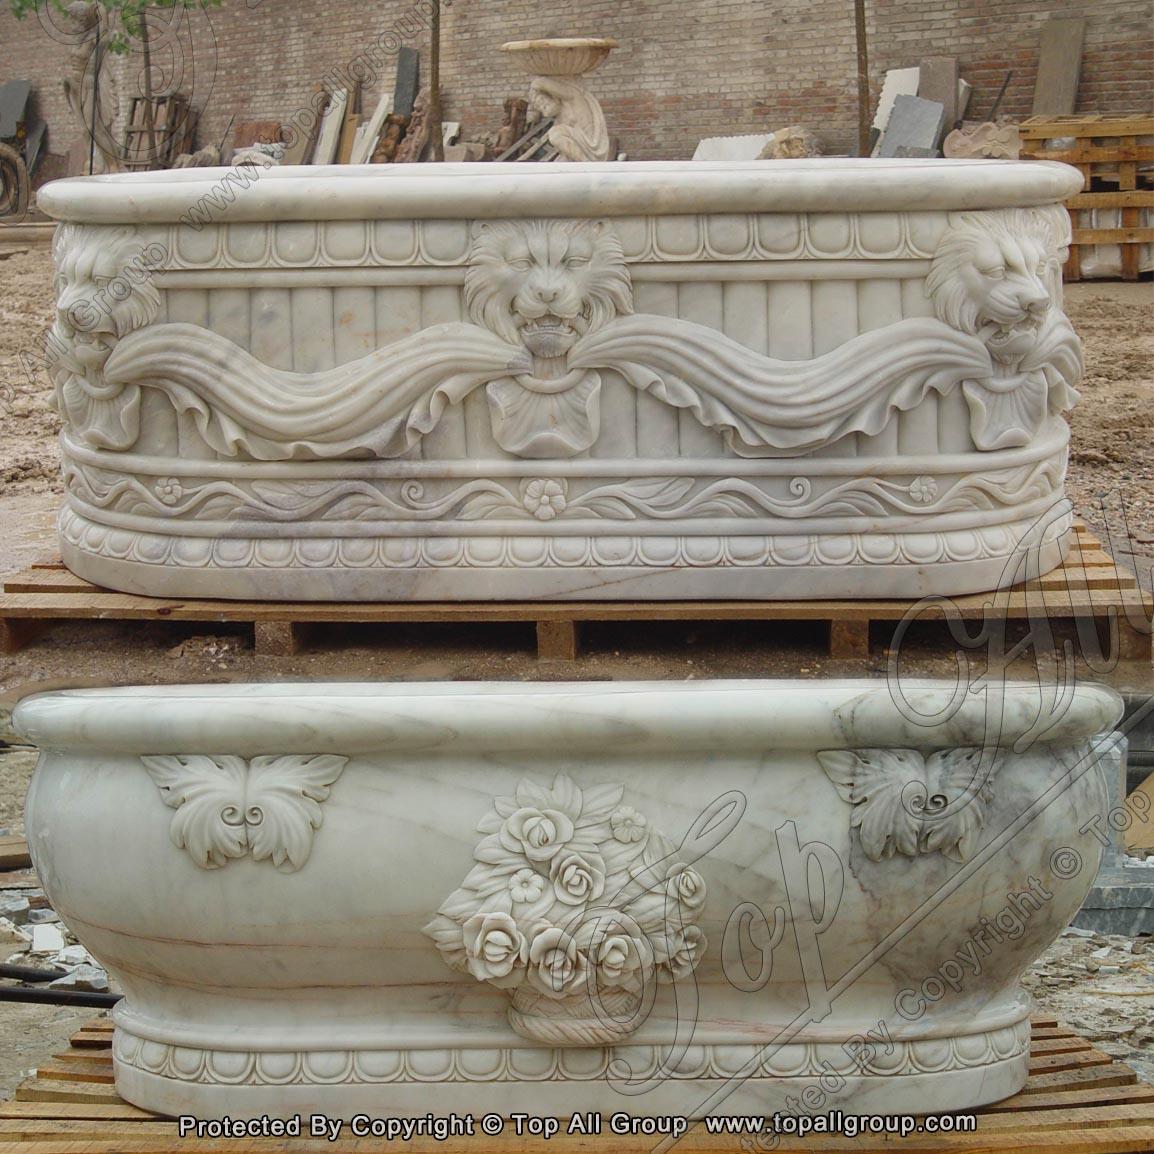 Carved Lion Head Marble Bathtub